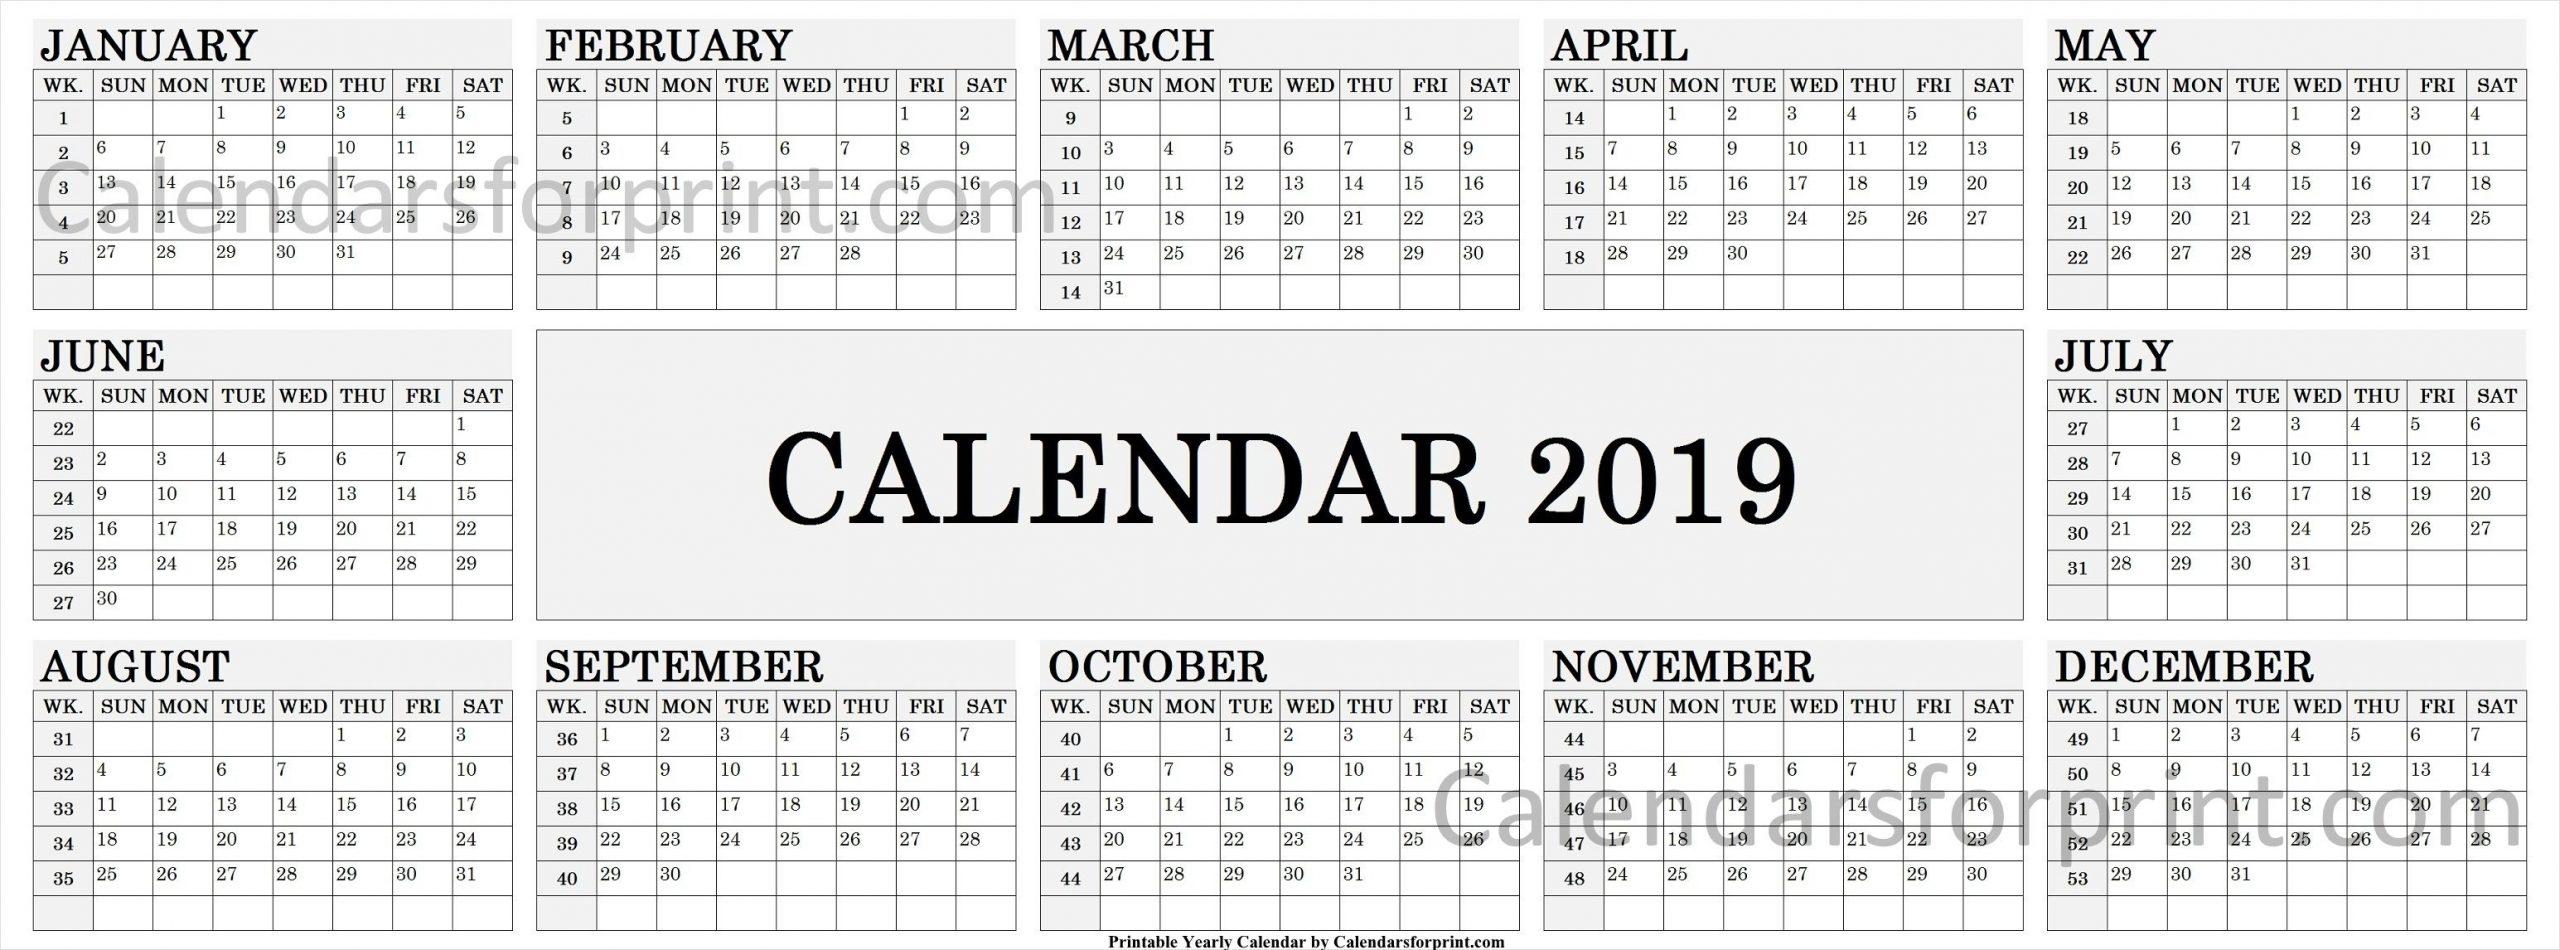 2019 Calendarweek | Weekly Calendar, Calendar With Week